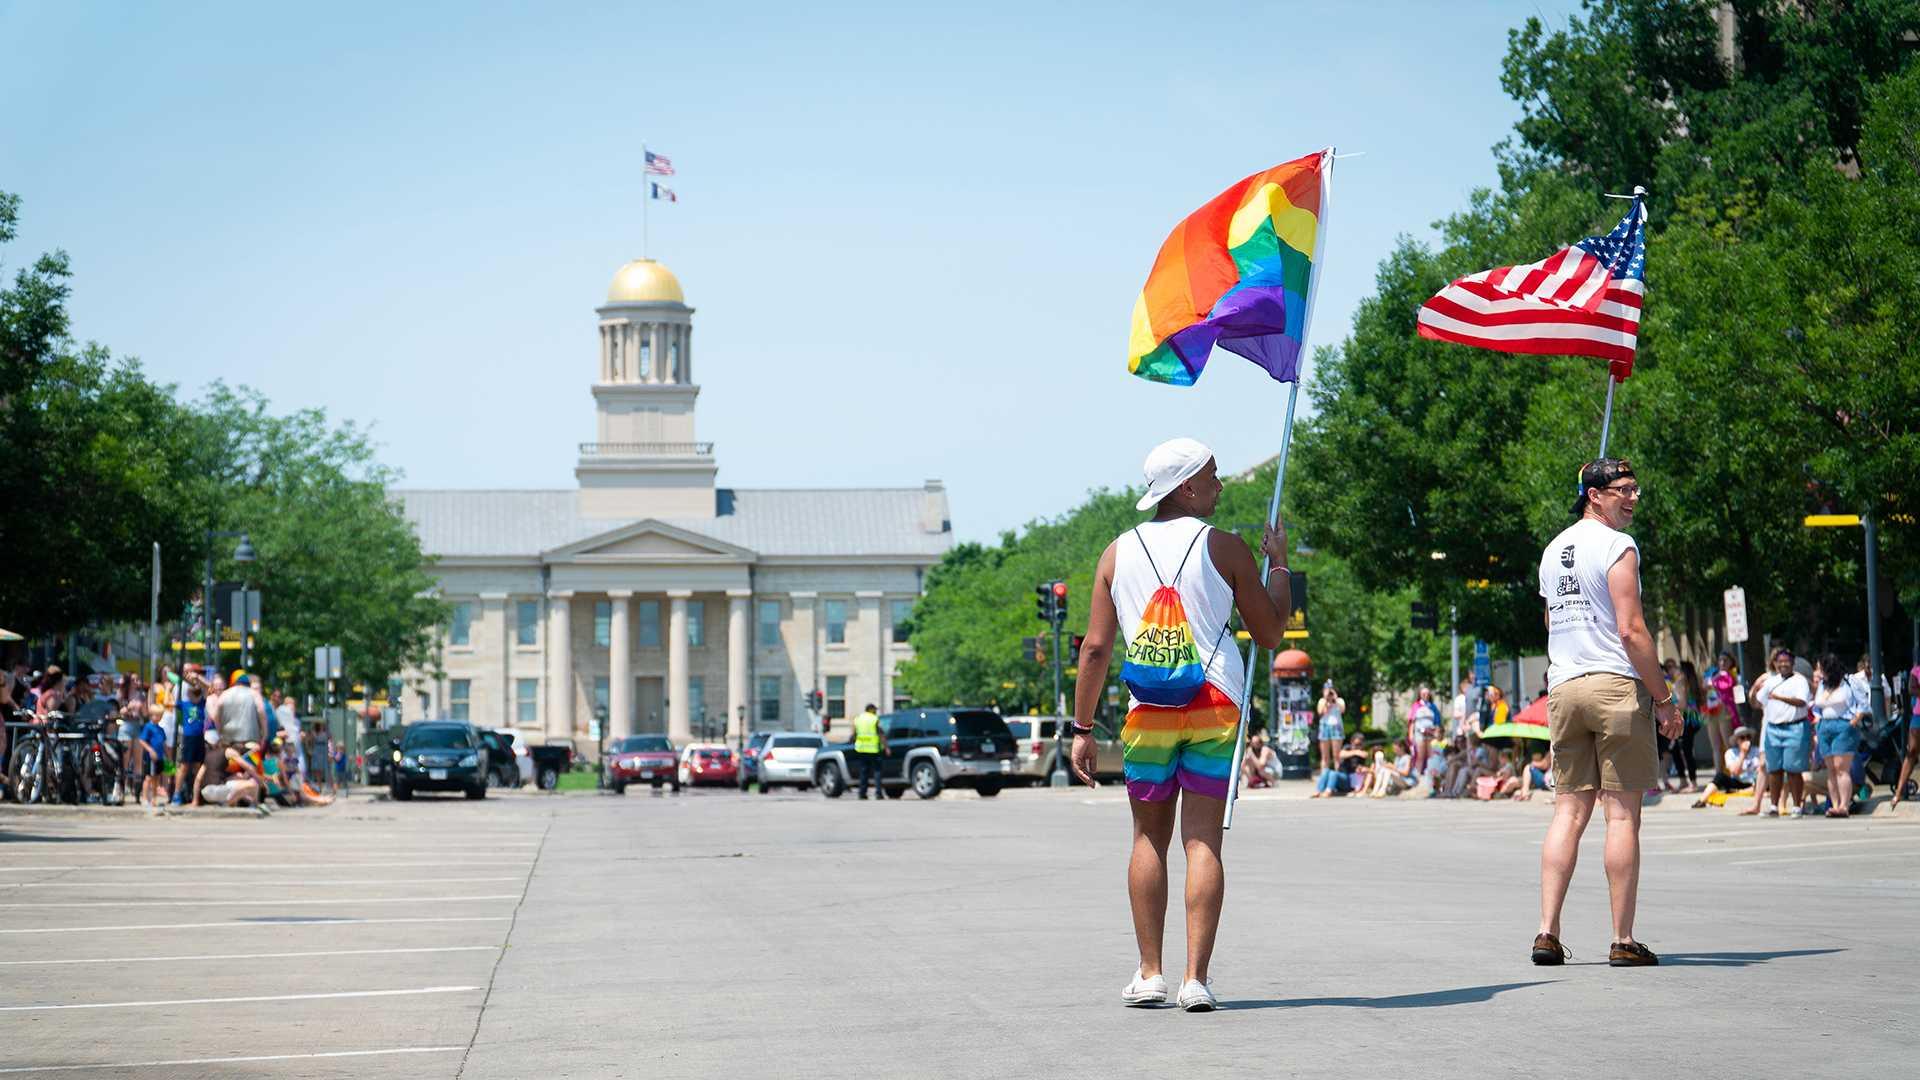 PHOTOS: Iowa City Pride Festival (6/16/18)